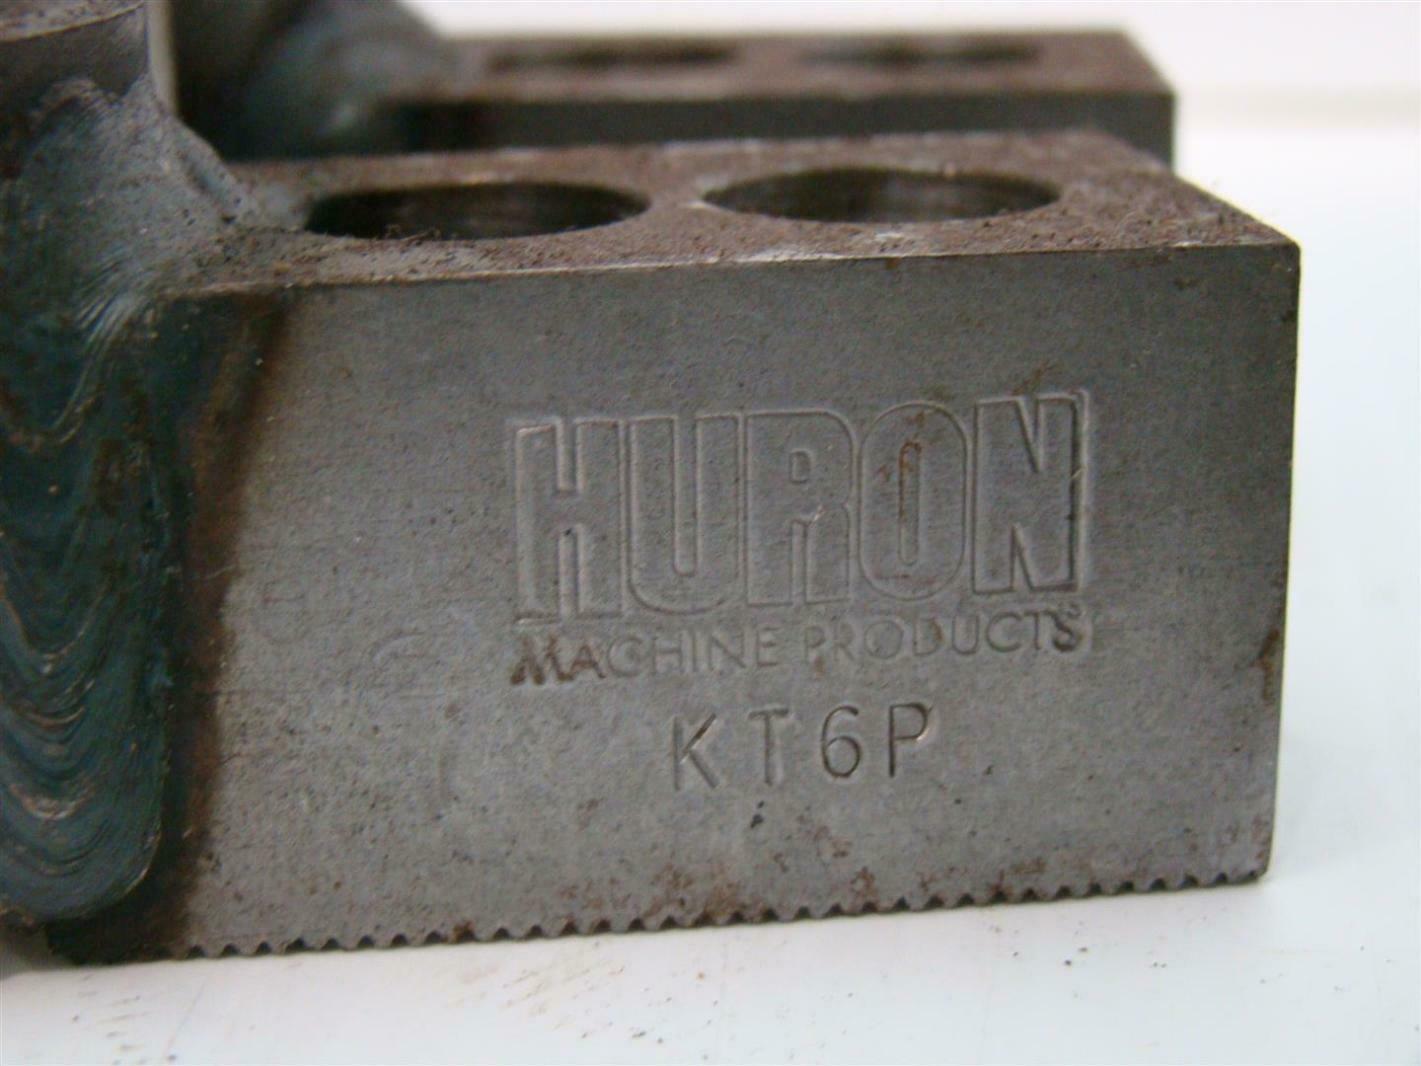 (3) Huron Custom Jaws for Lathe Chuck 1.2590 x 2.8125 x 0 ...